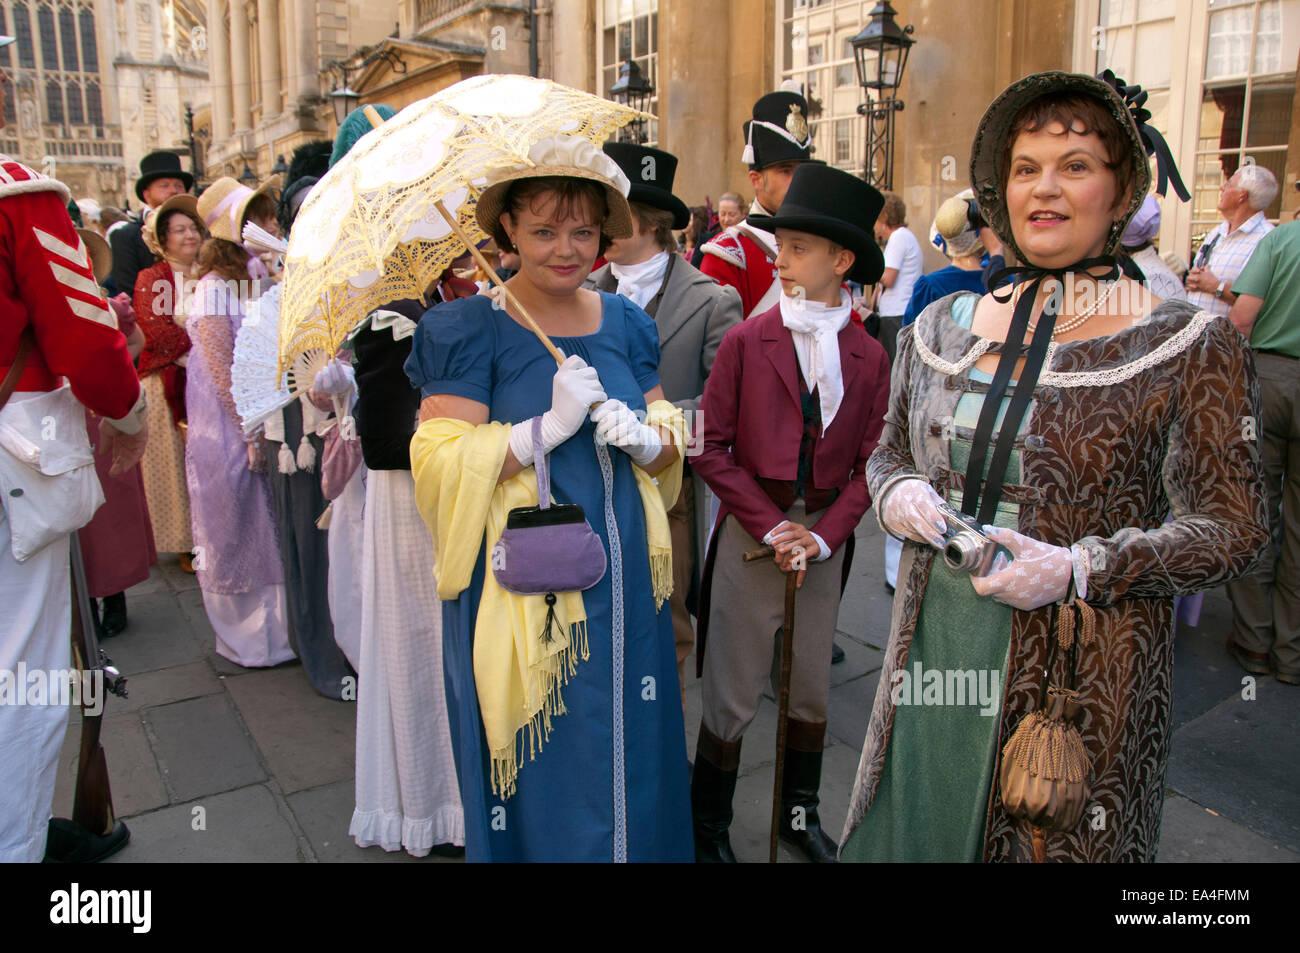 Jane Austen festival. Imagen De Stock